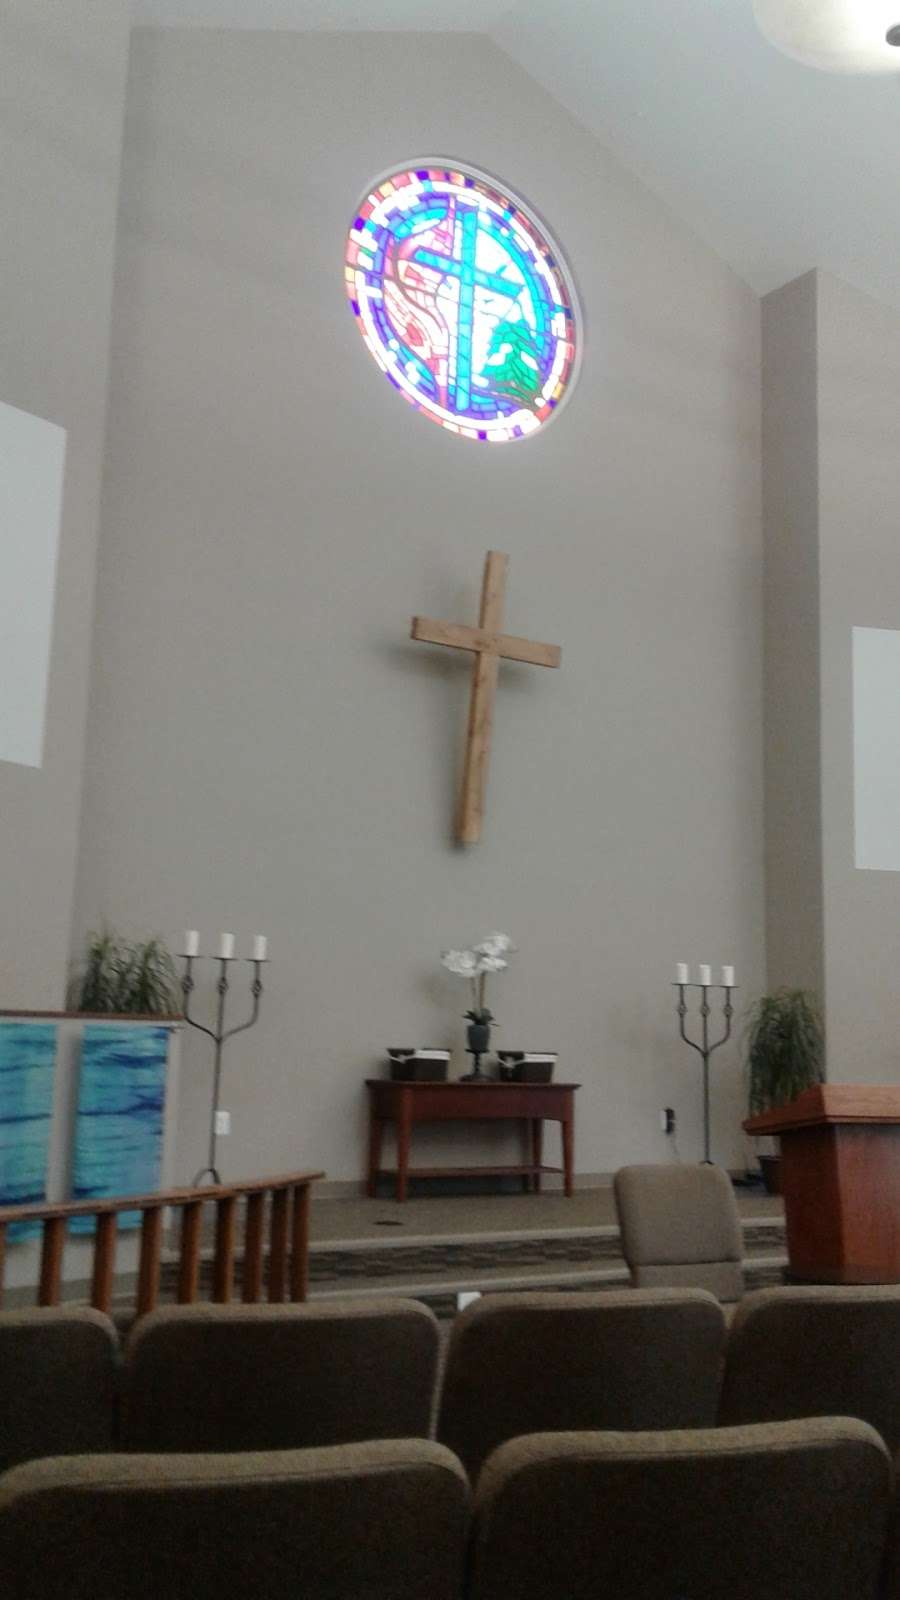 Evergreen Church - church    Photo 1 of 2   Address: 19619 Evergreen Mills Rd, Leesburg, VA 20175, USA   Phone: (703) 737-7700